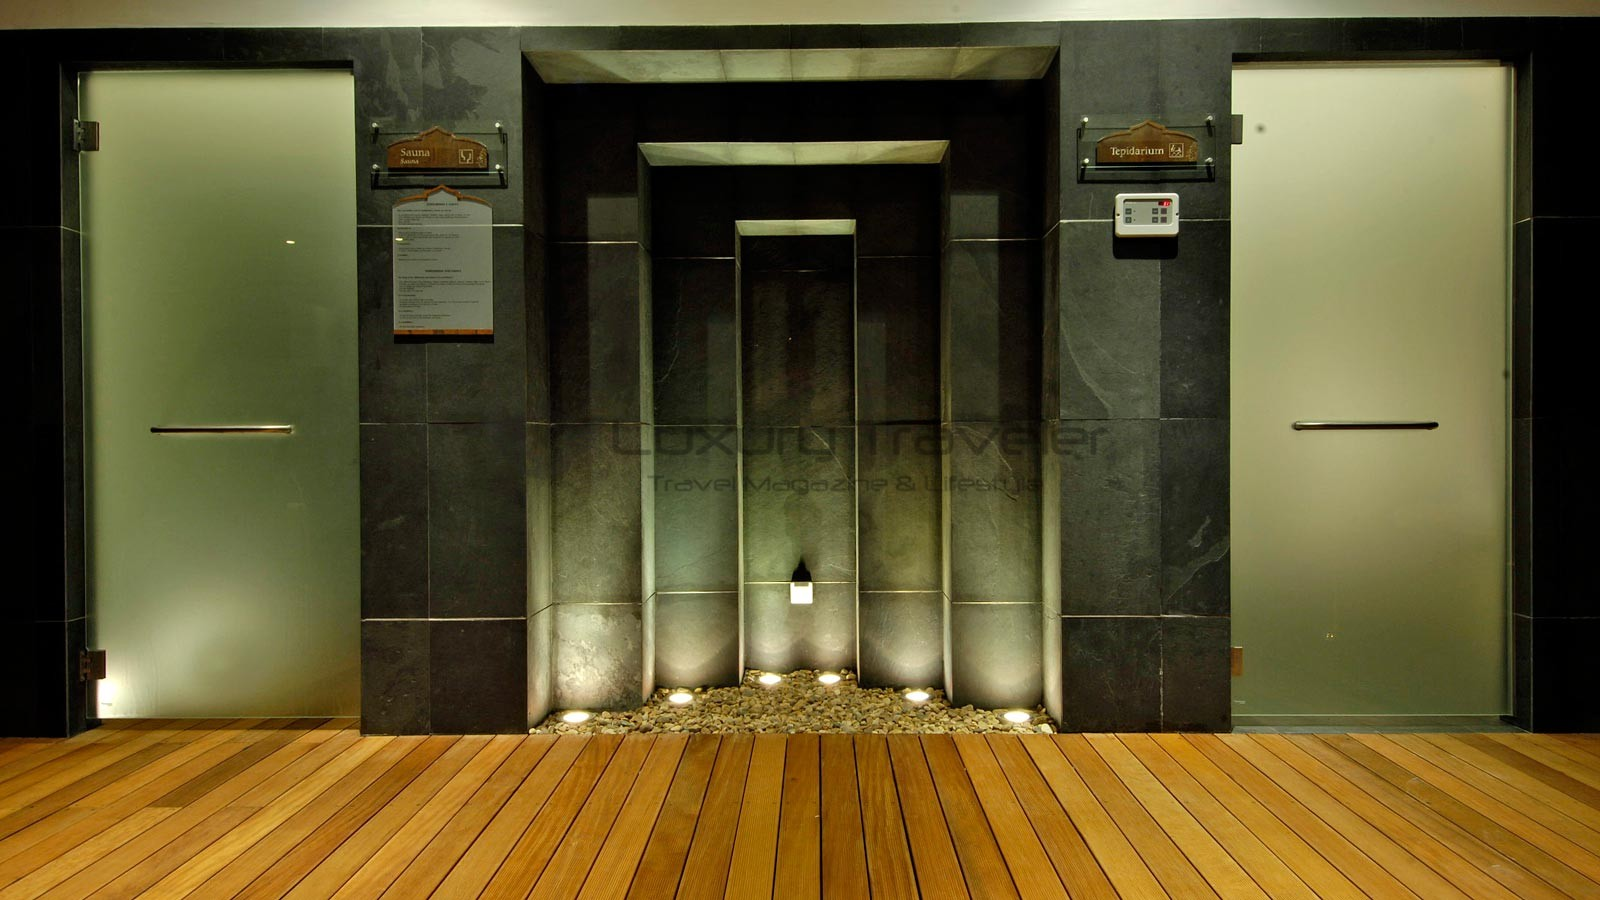 Convento_Espinheiro_Hotel_Evora_Starwood_Sauna_Spa